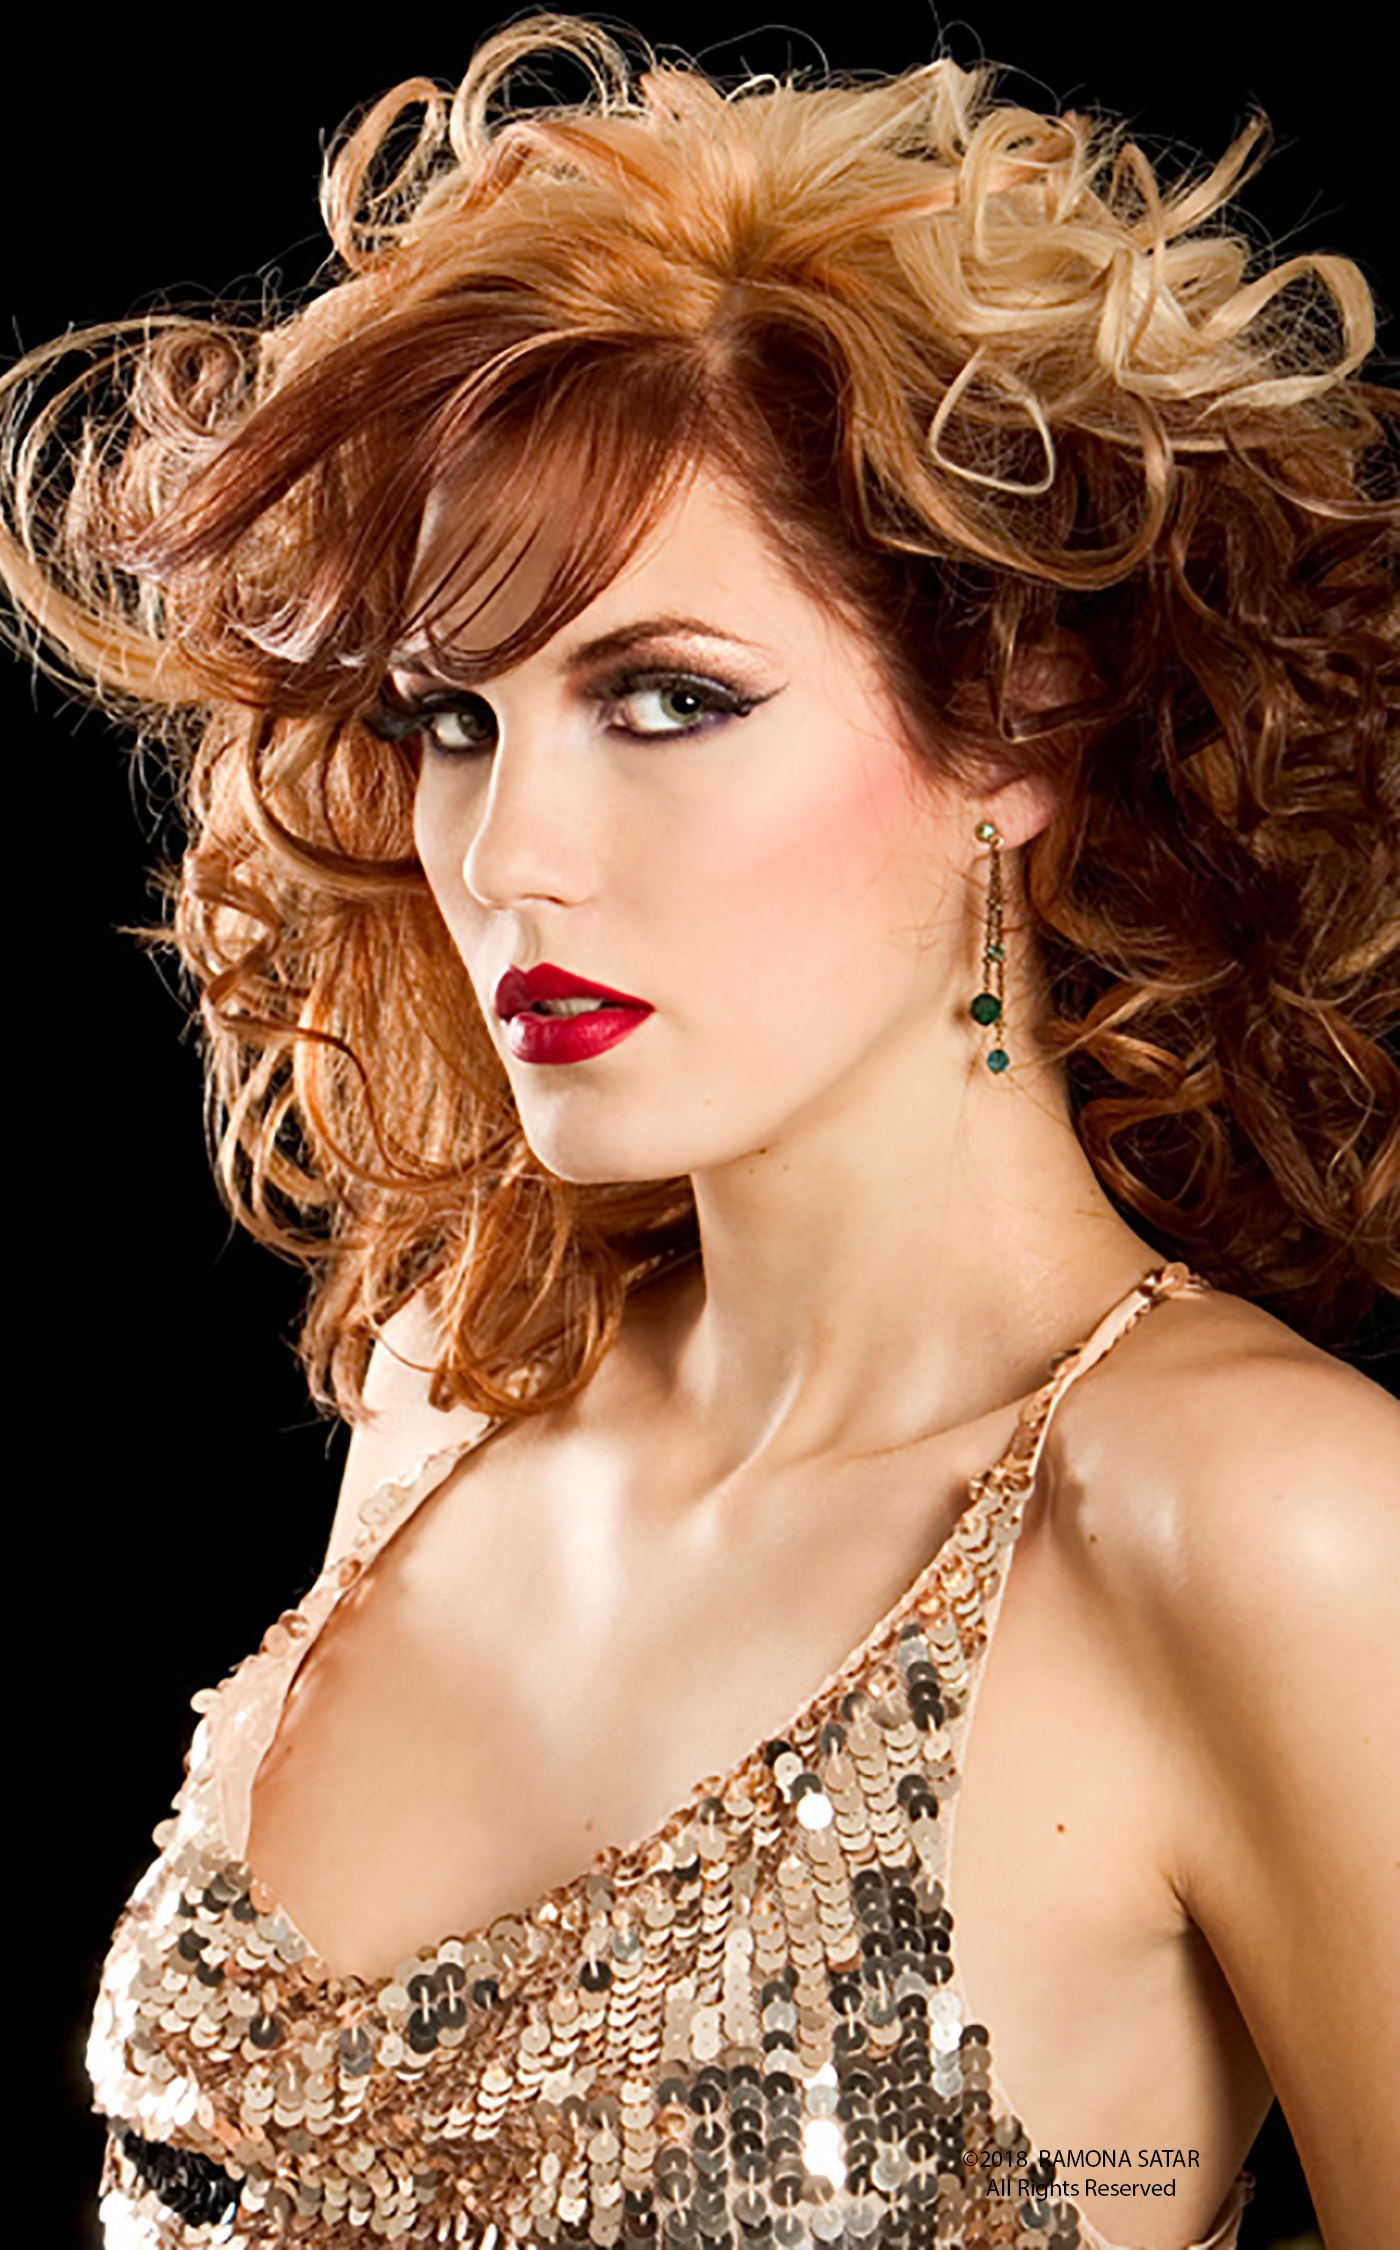 Ramona Satar Sabrina_01.jpg